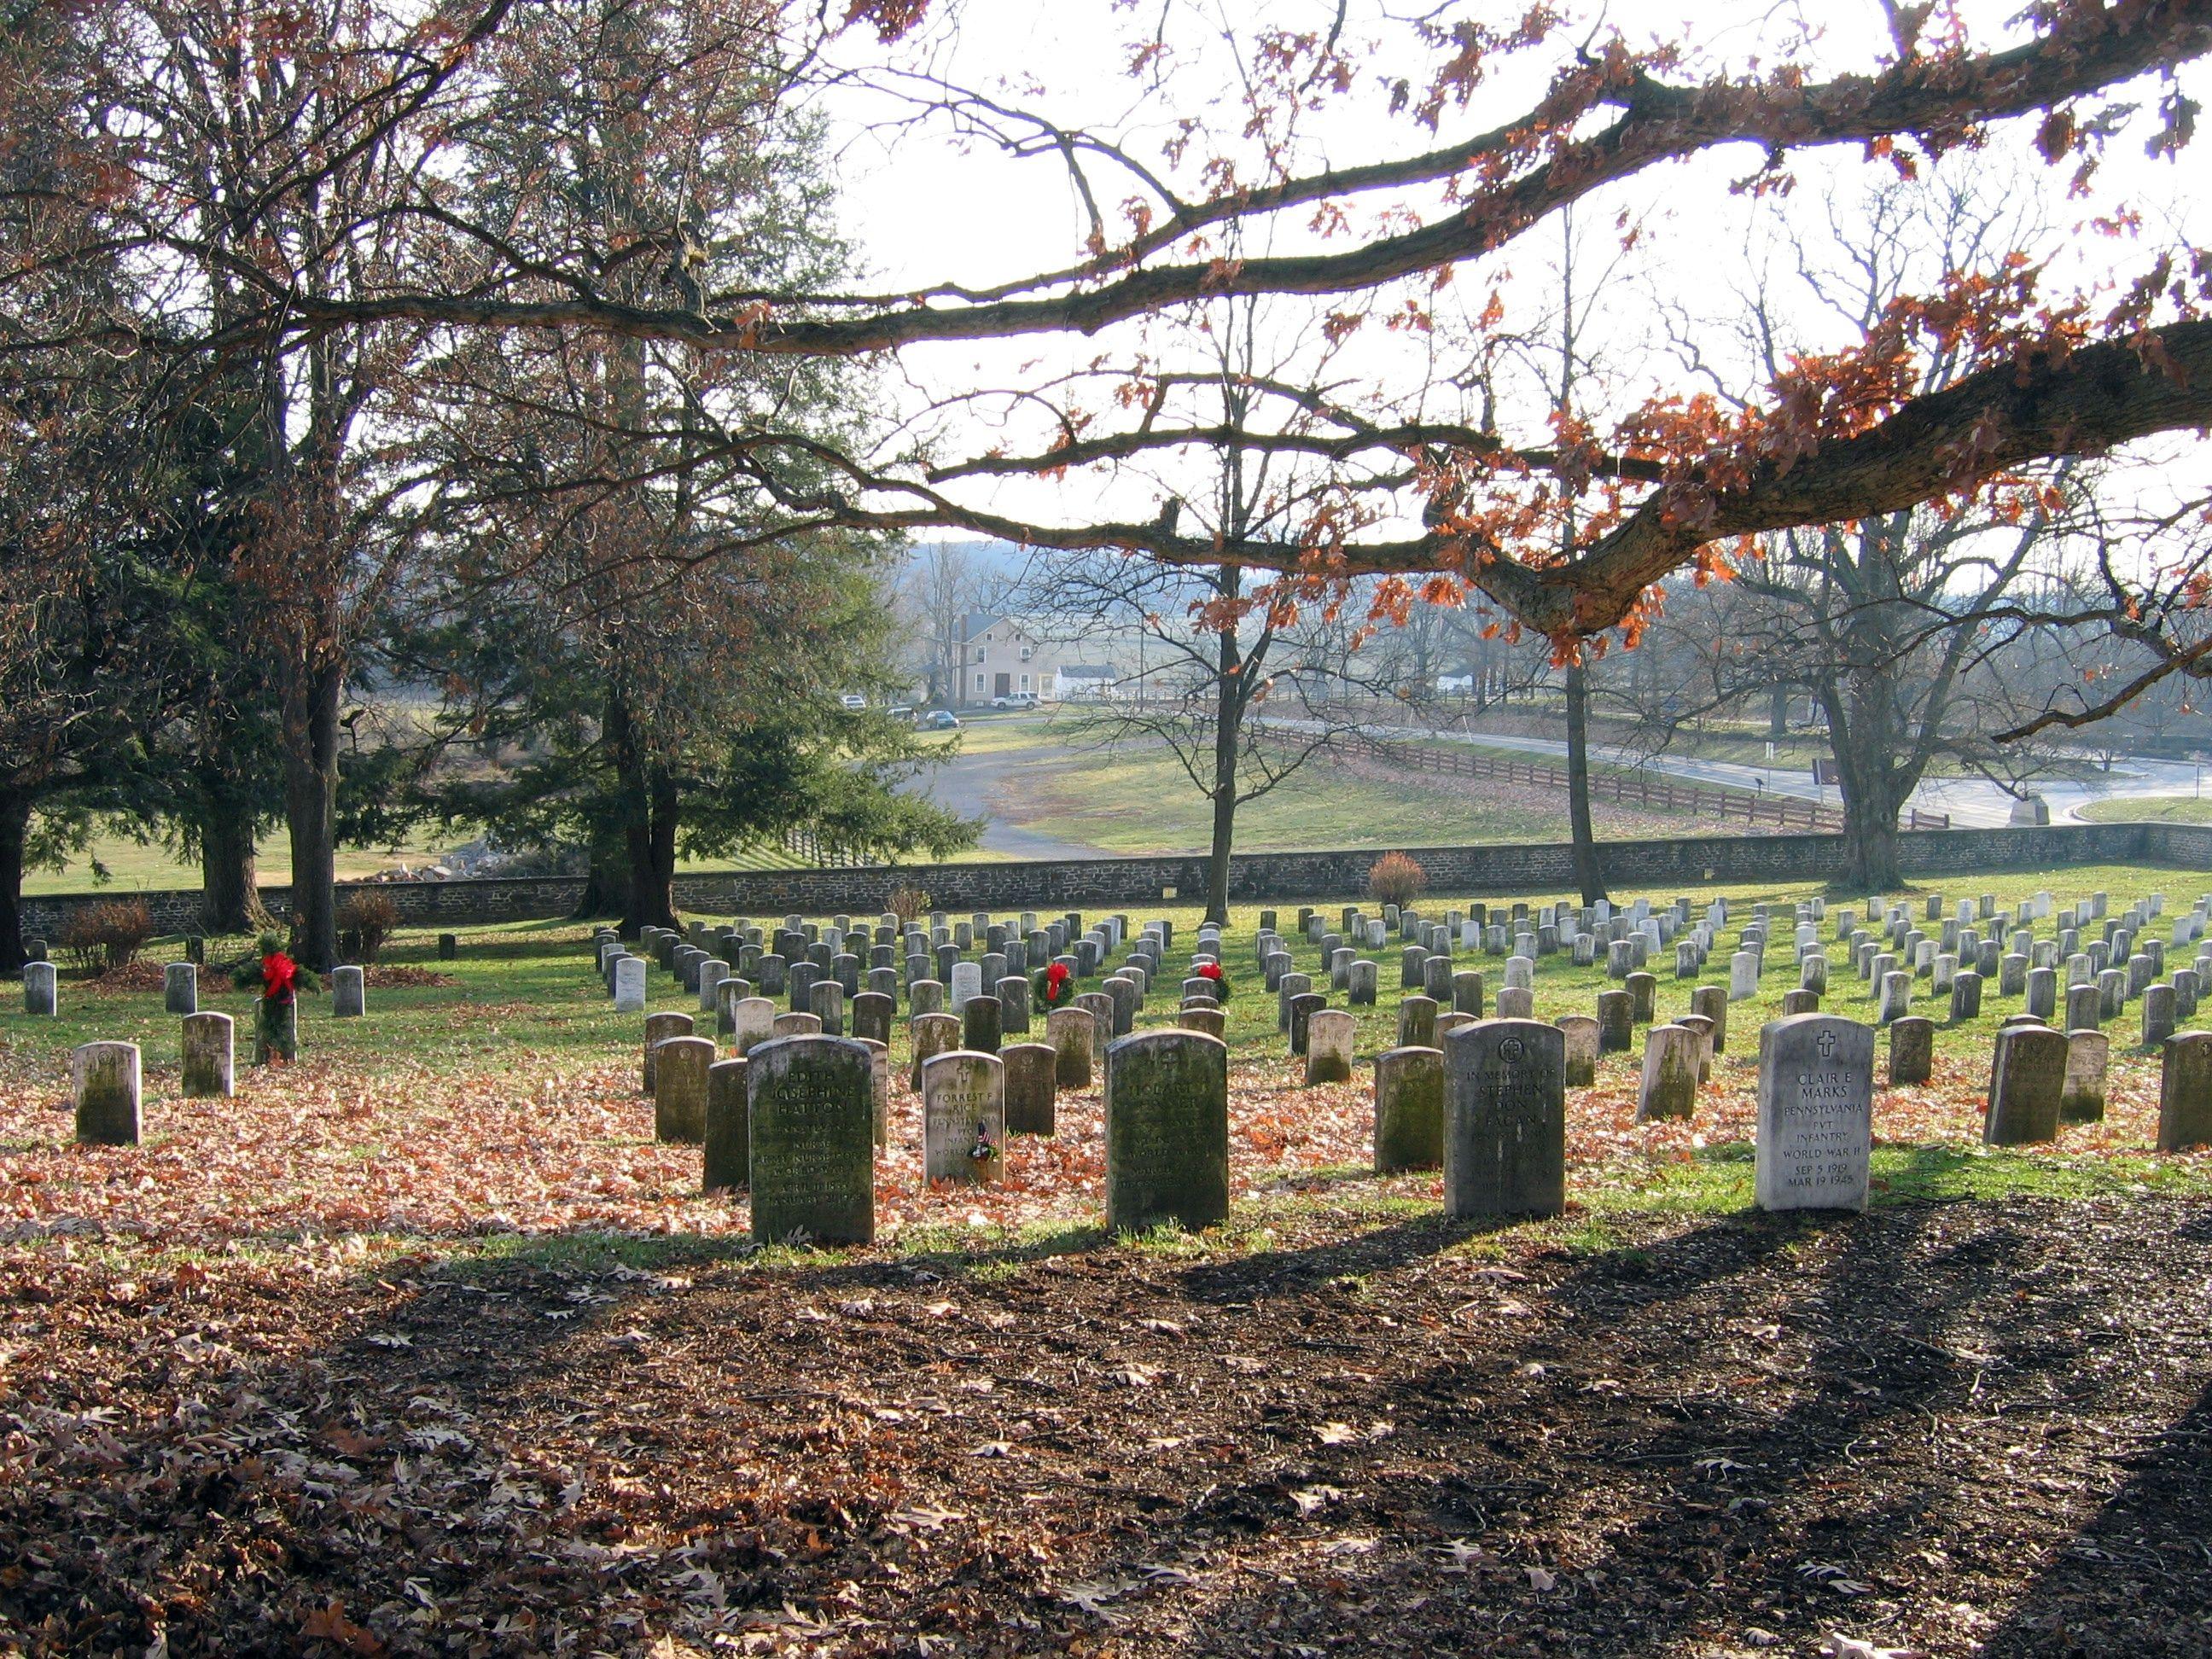 Soldiers National Cemetery At Gettysburg Dedicated On November